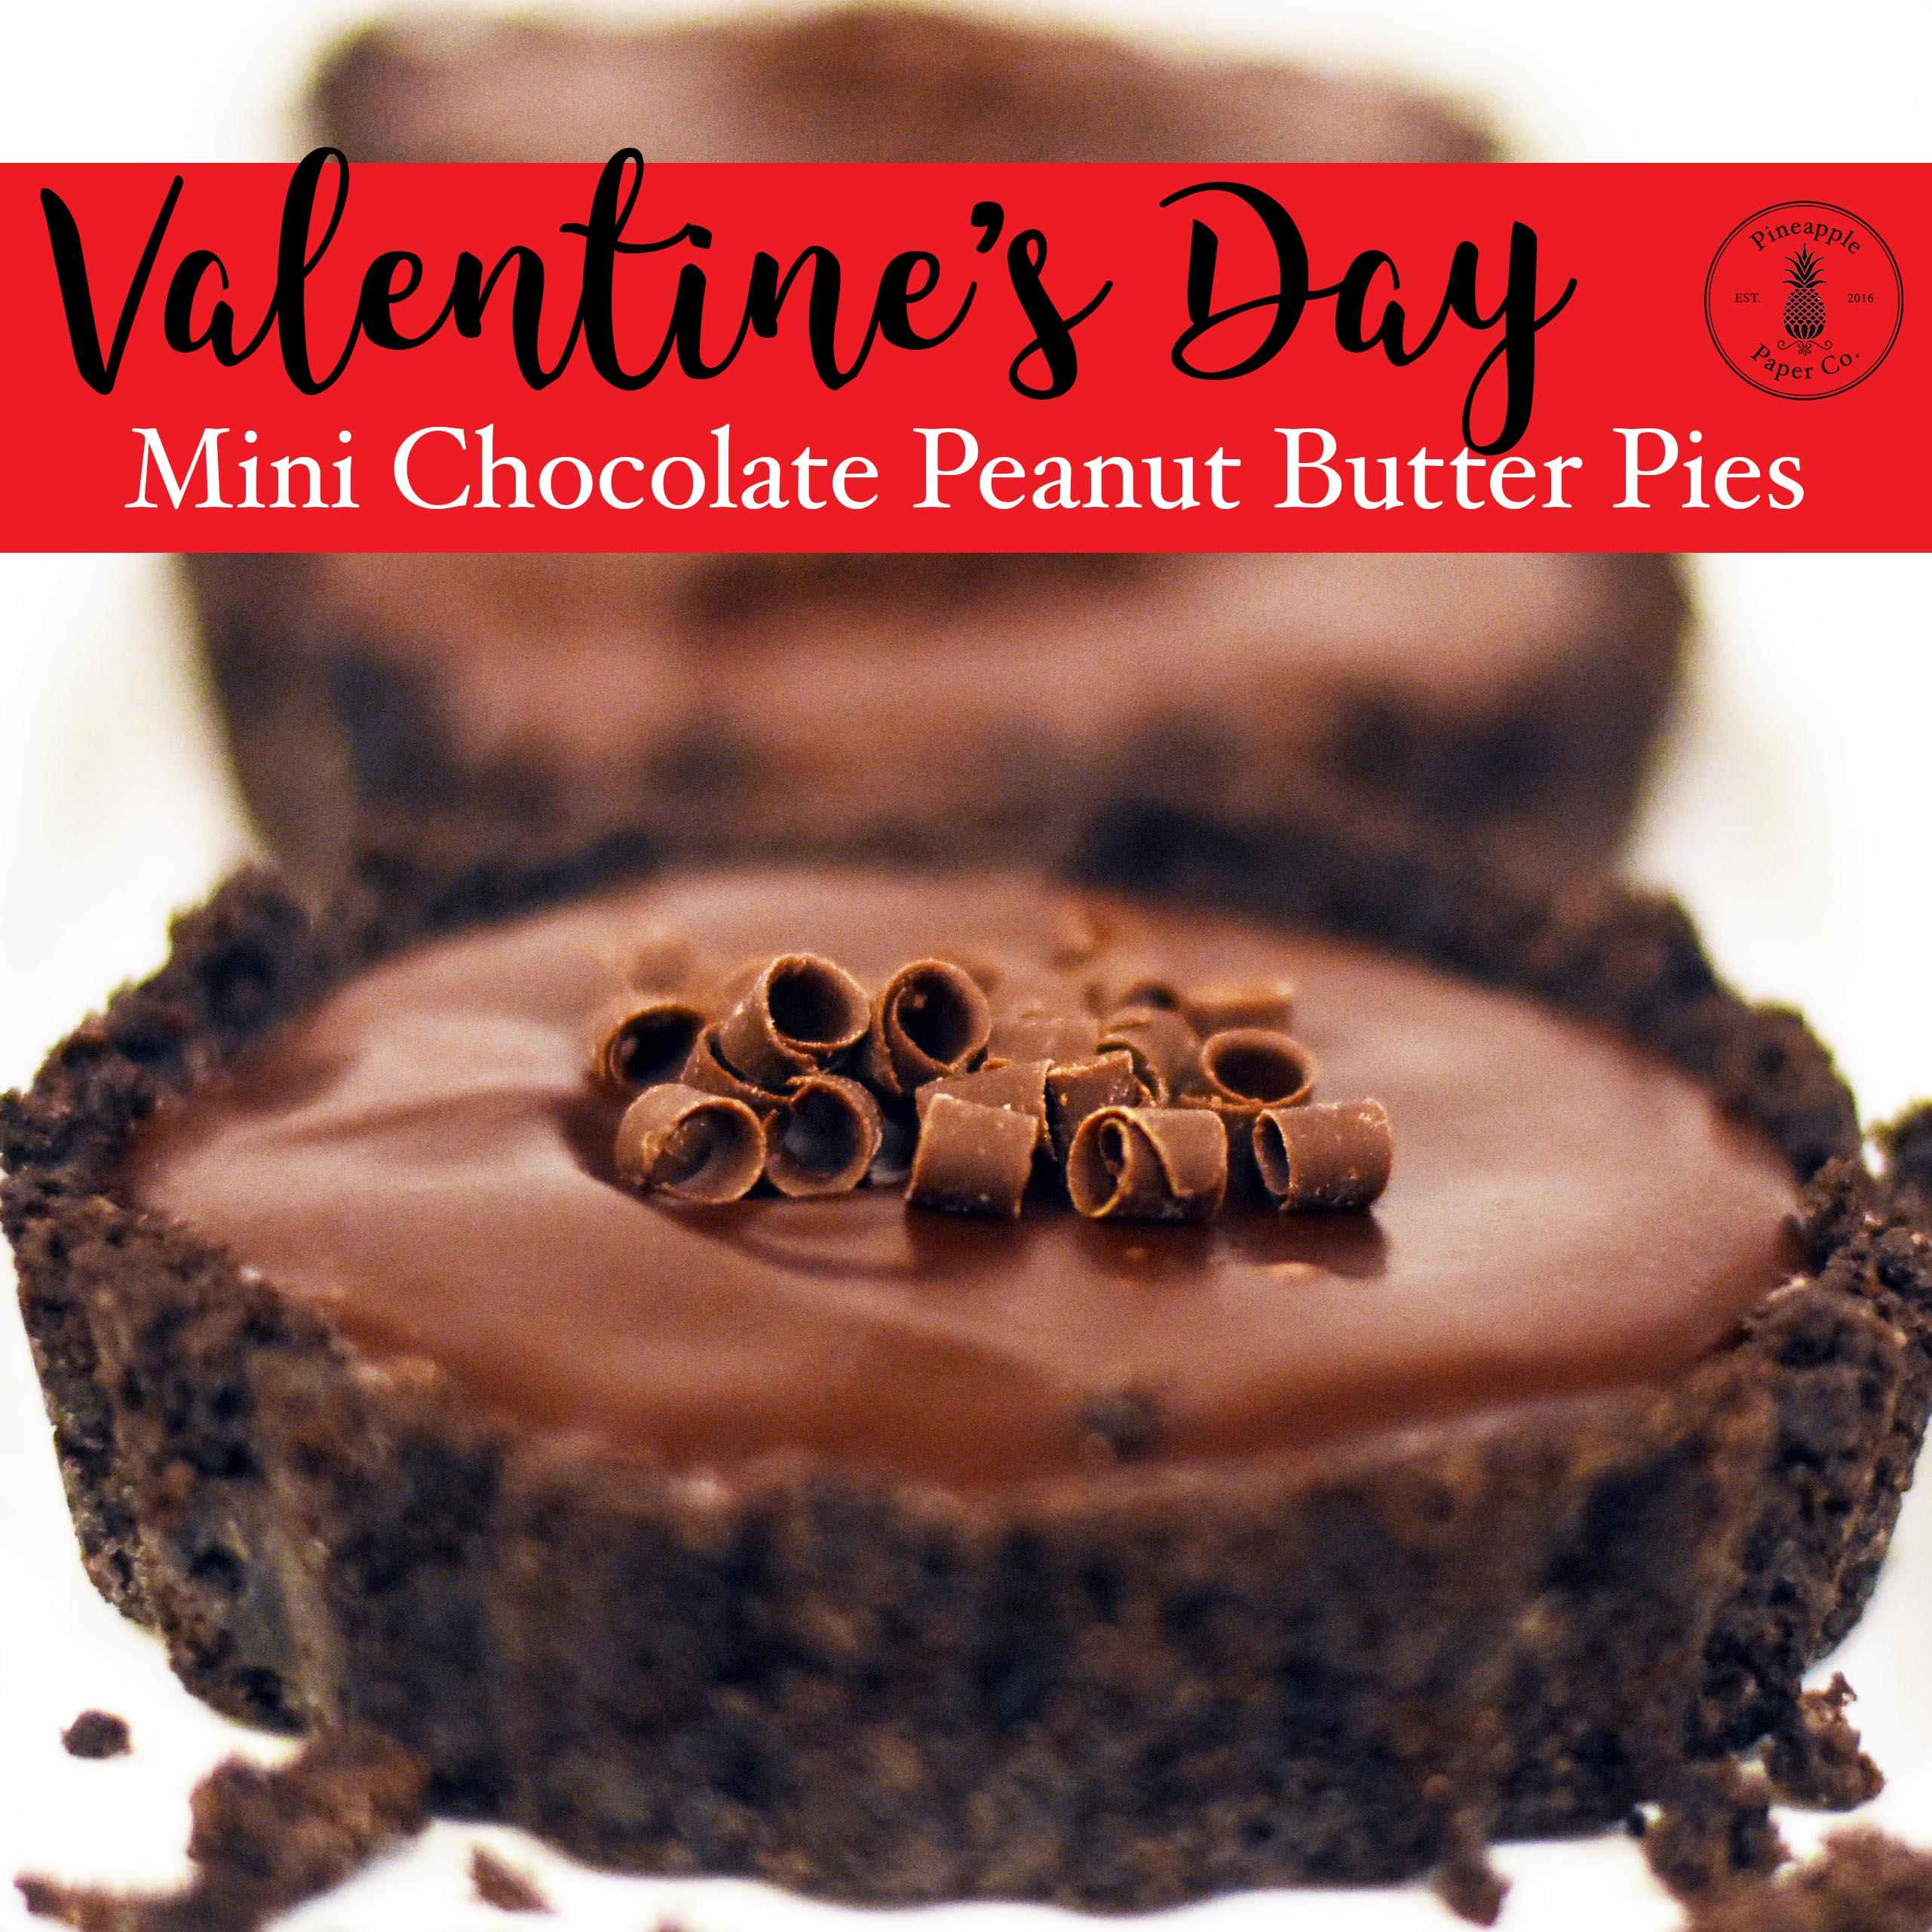 {Valentine's Day} Mini Chocolate Peanut Butter Pie